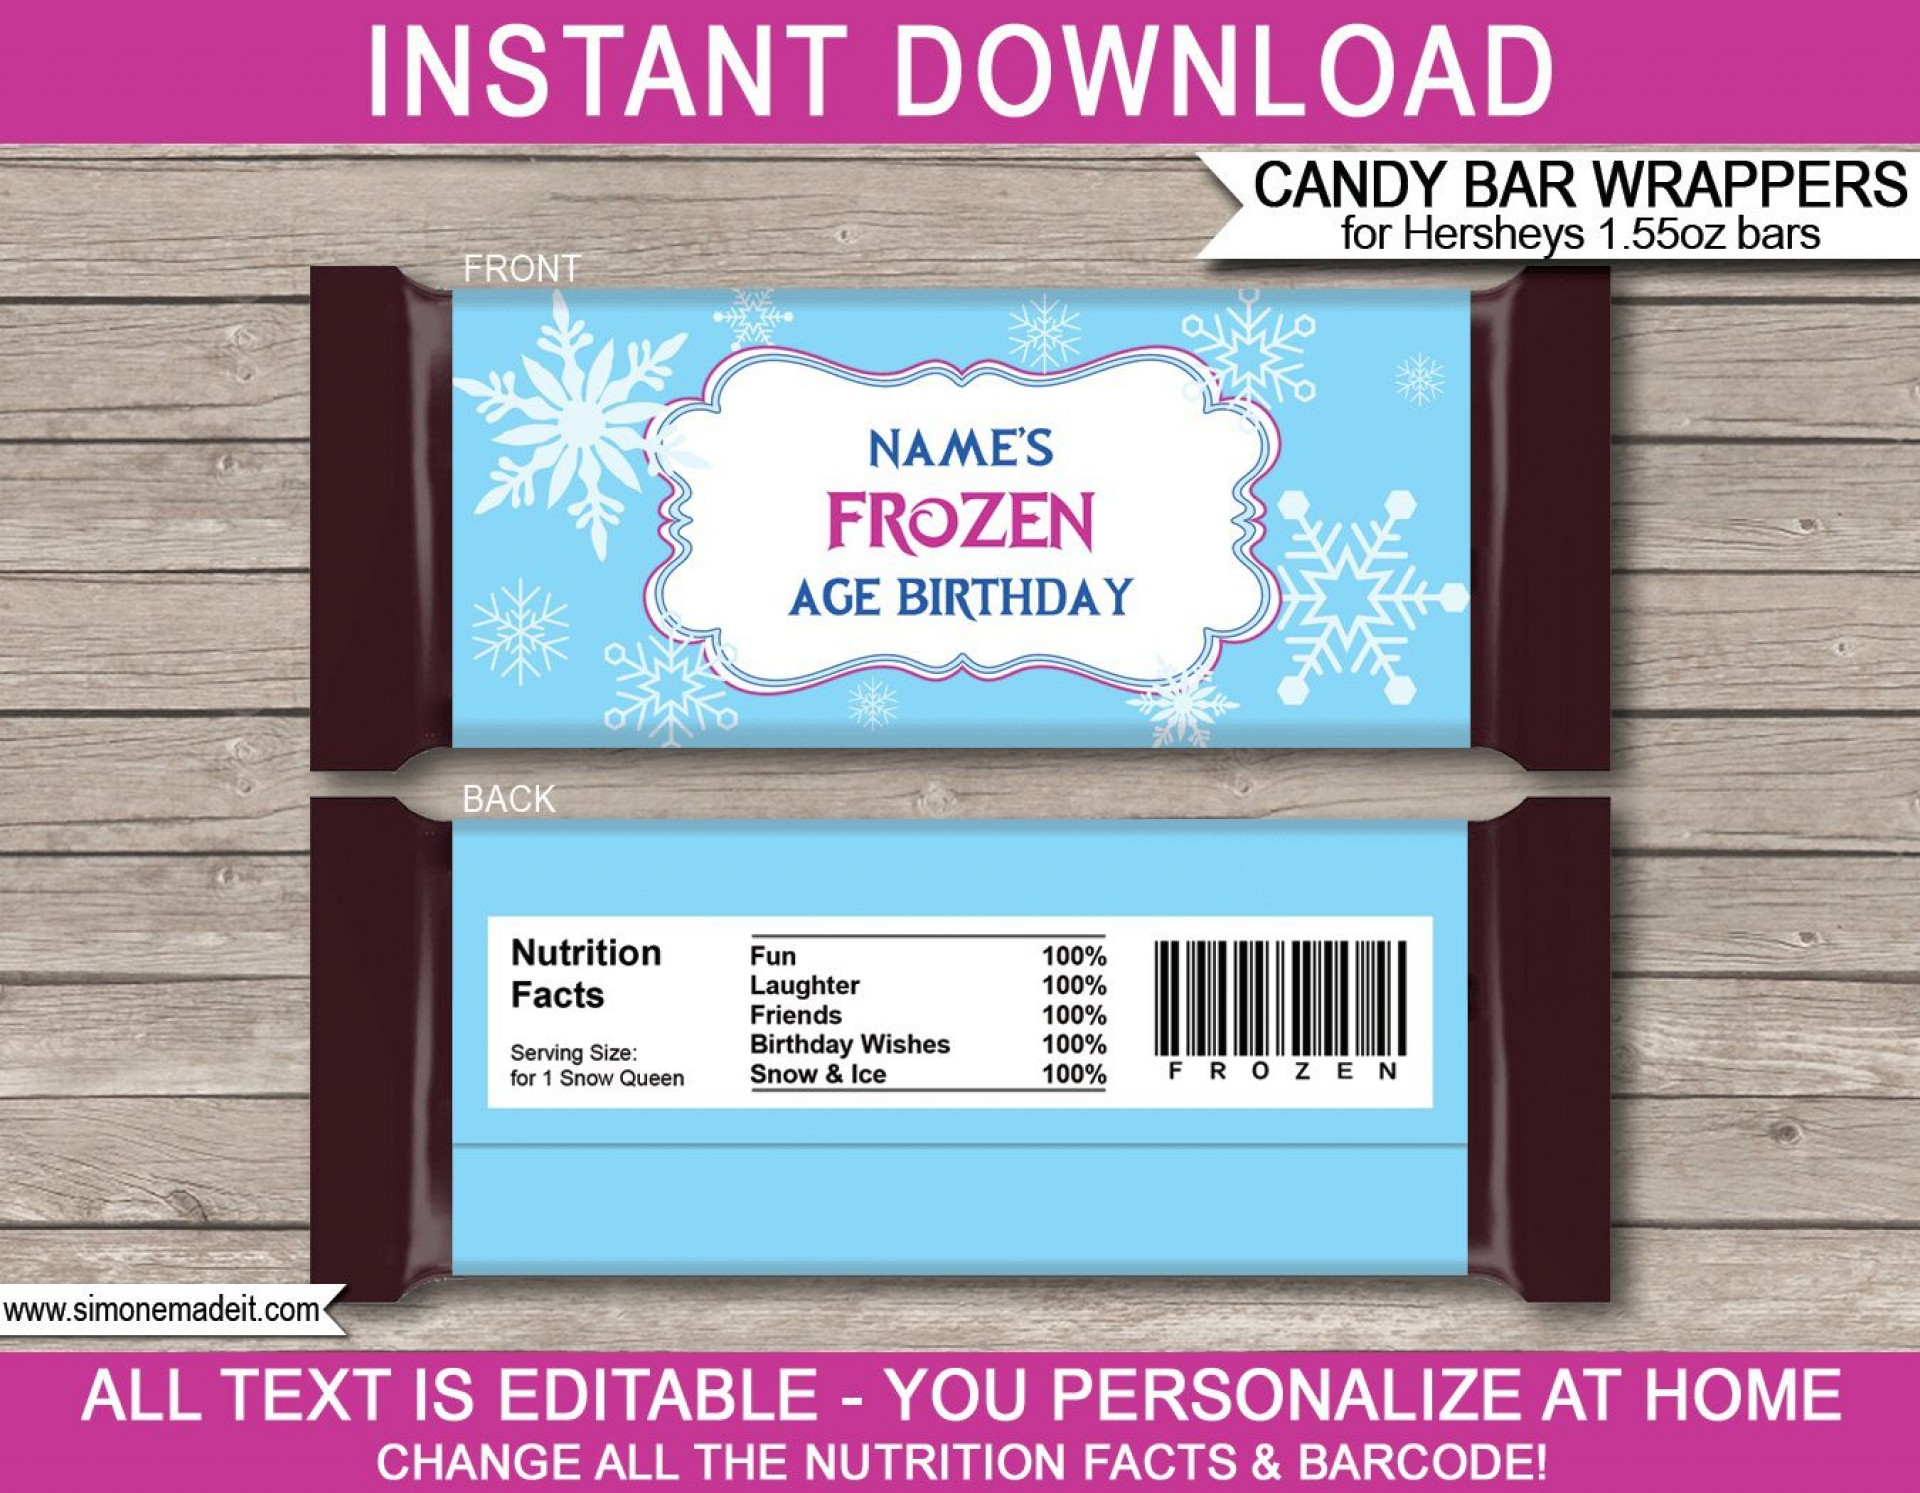 007 Striking Chocolate Bar Wrapper Template Example  Candy Free Printable Mini Illustrator1920